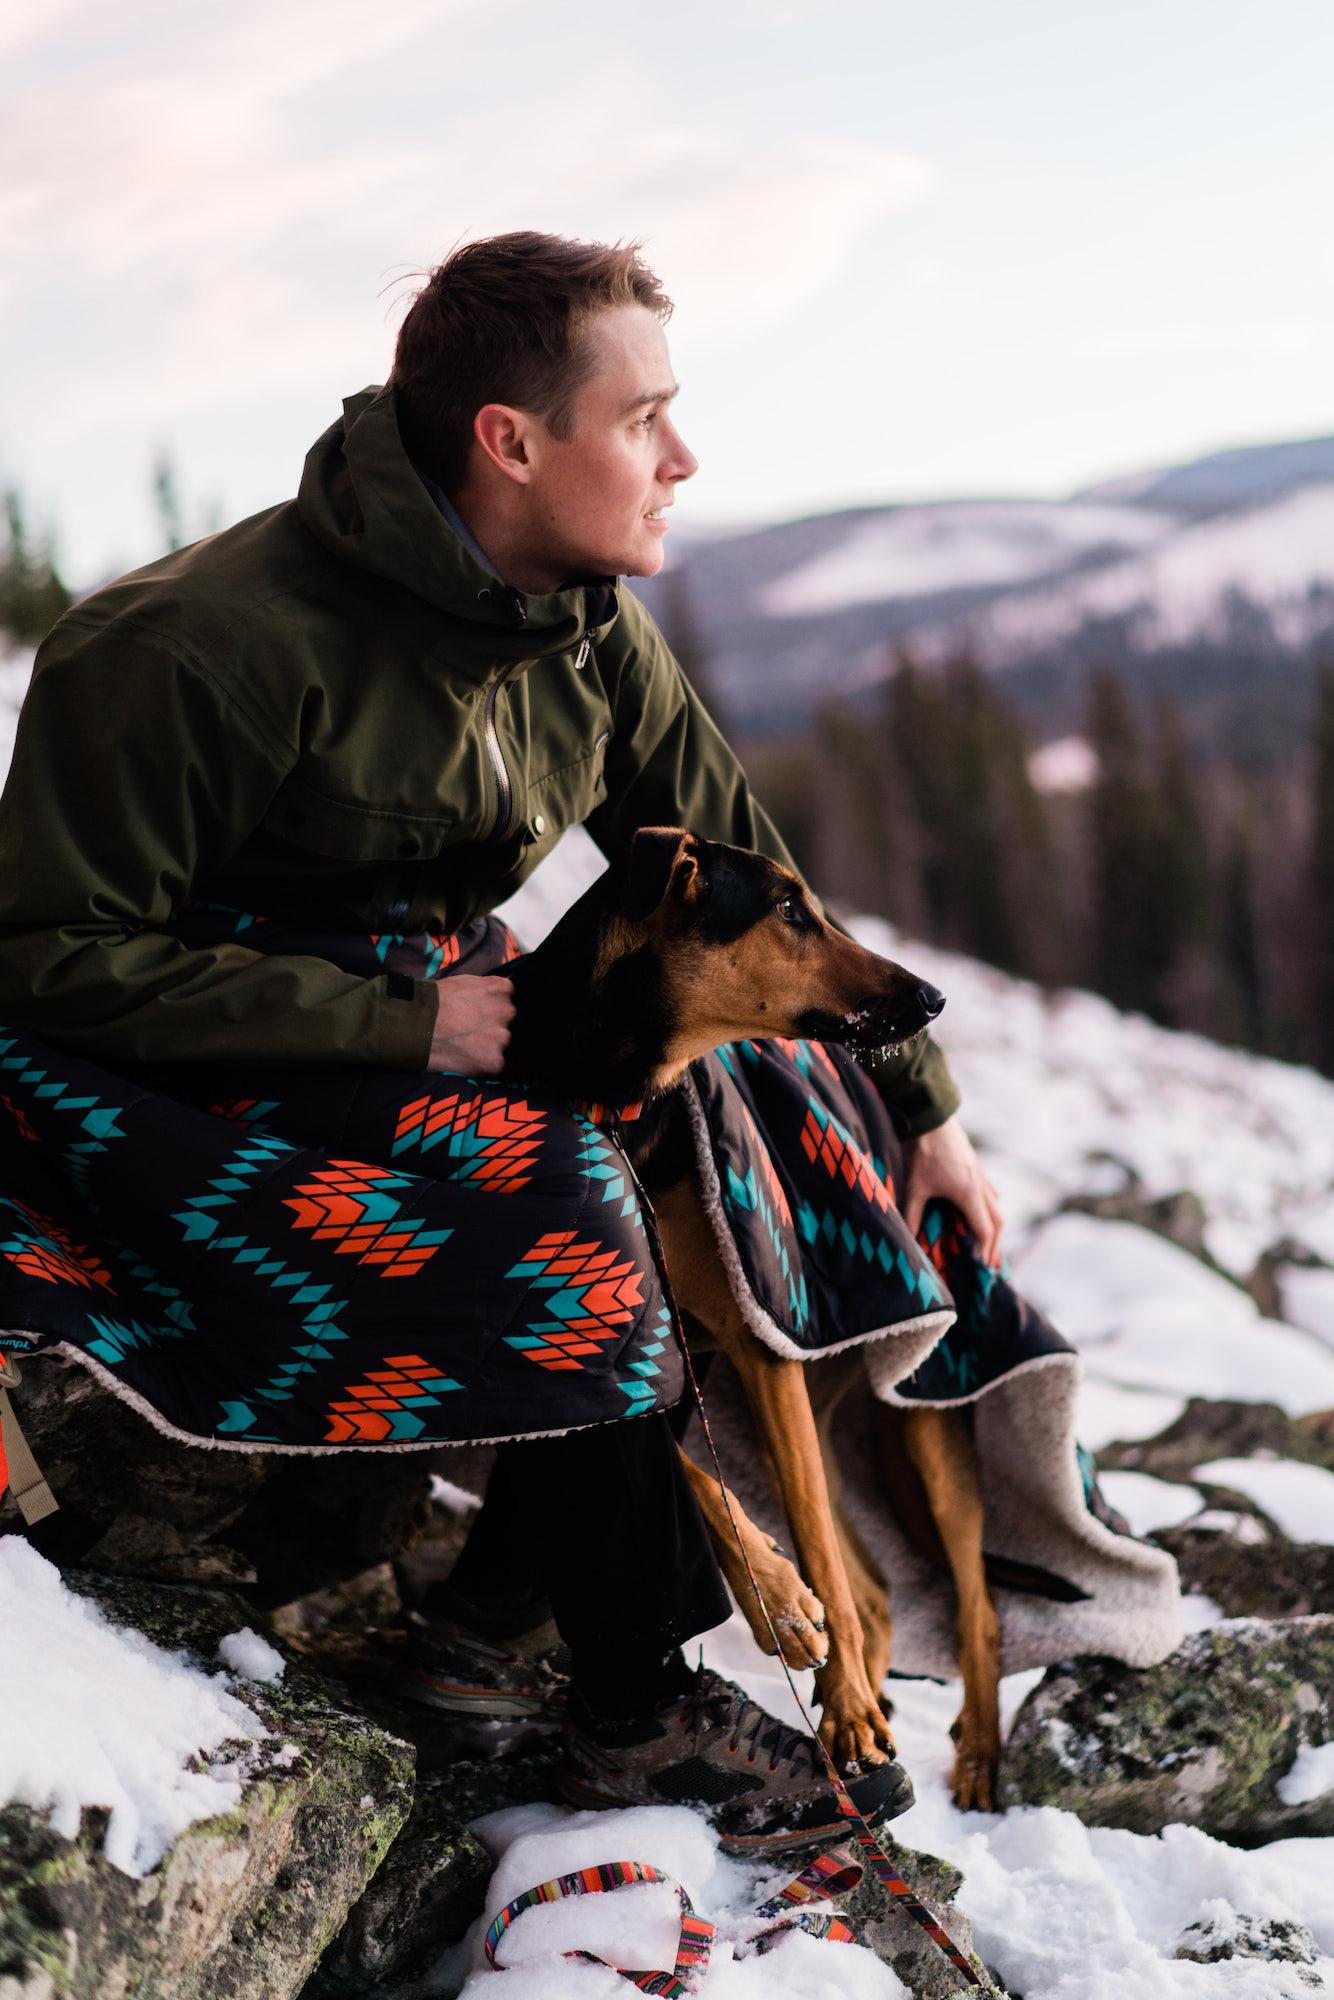 R18 Puffy Sherpa Pathfinder @travywild Winter_Park (45 of 55)